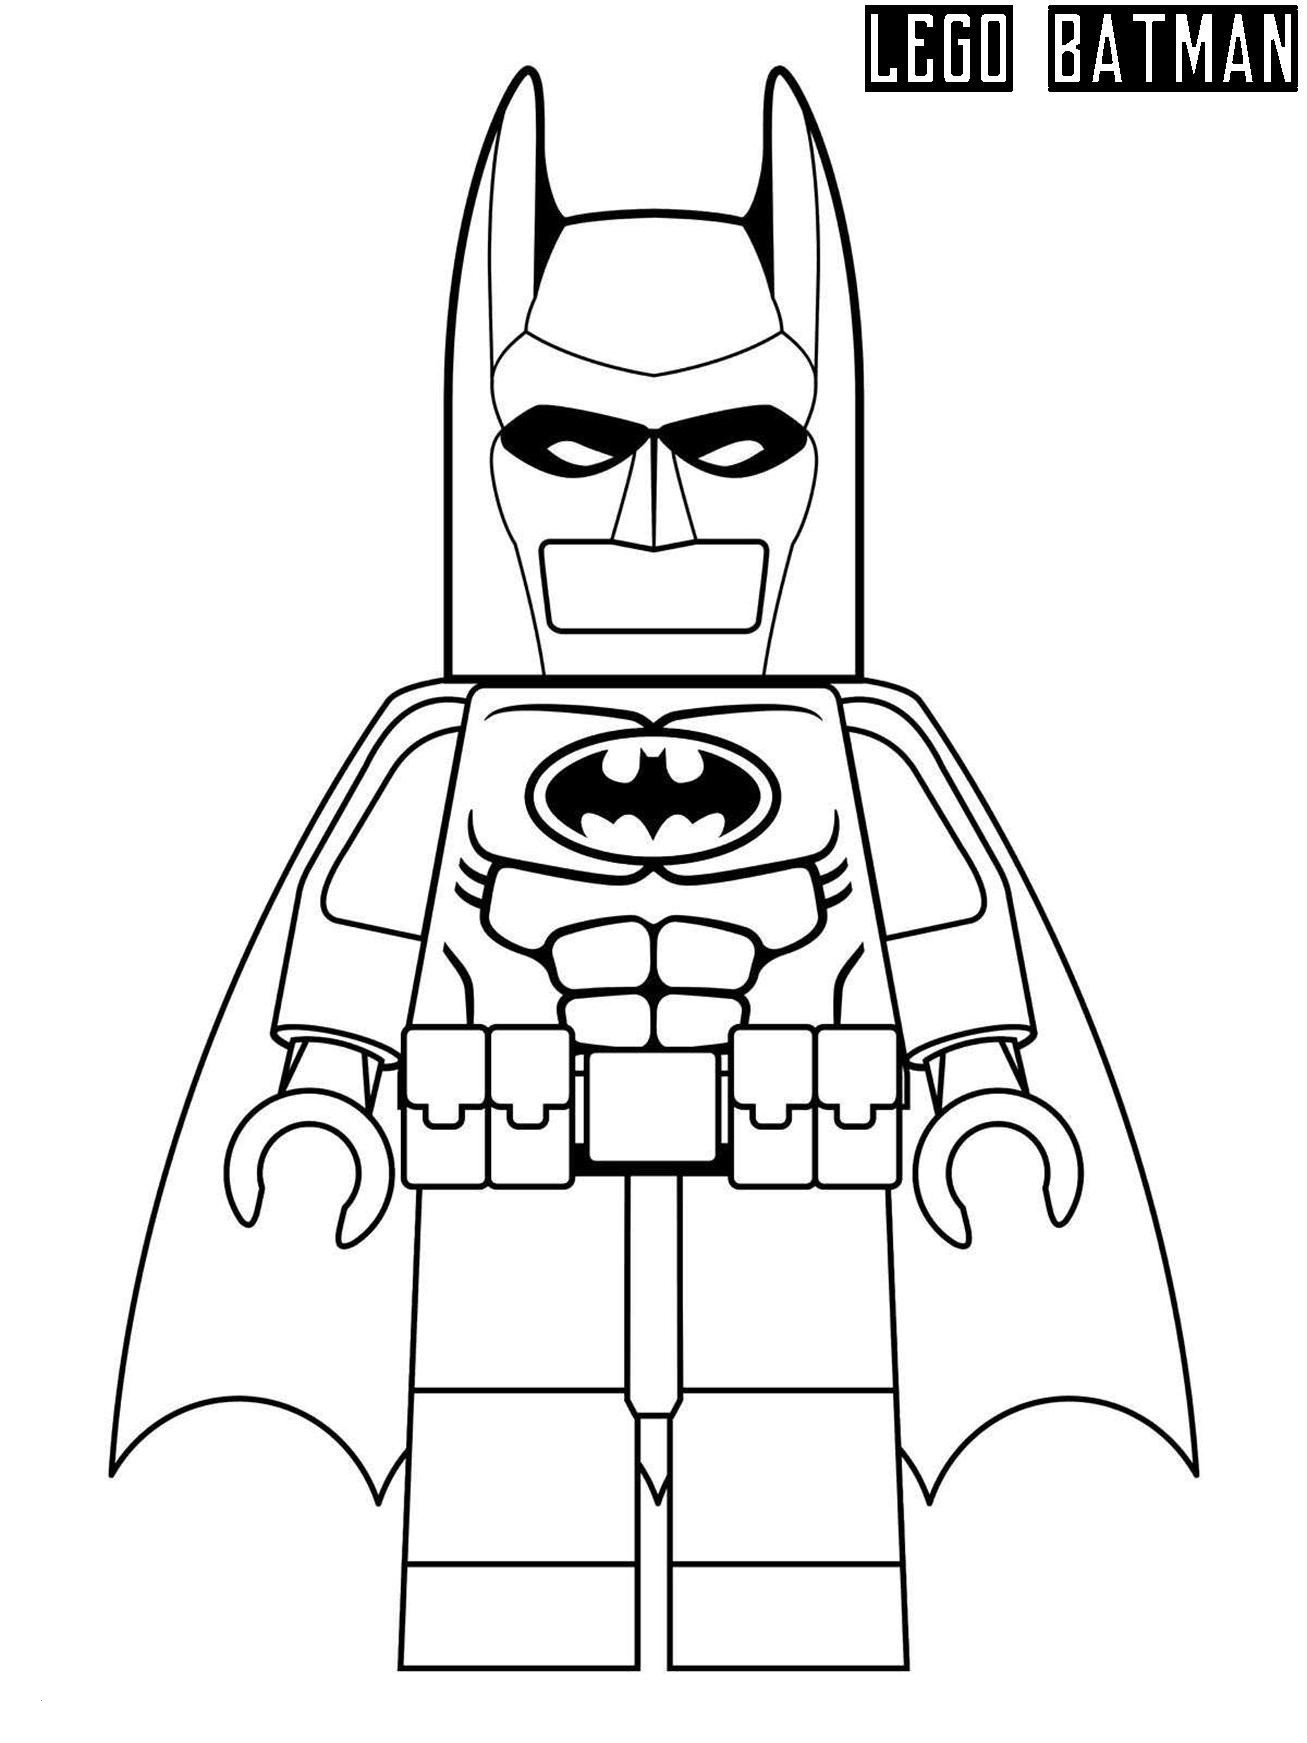 Ausmalbilder Batman Lego Inspirierend Malvorlagen Igel Inspirierend Malvorlagen Igel Süß Pin 70 Frisch Galerie